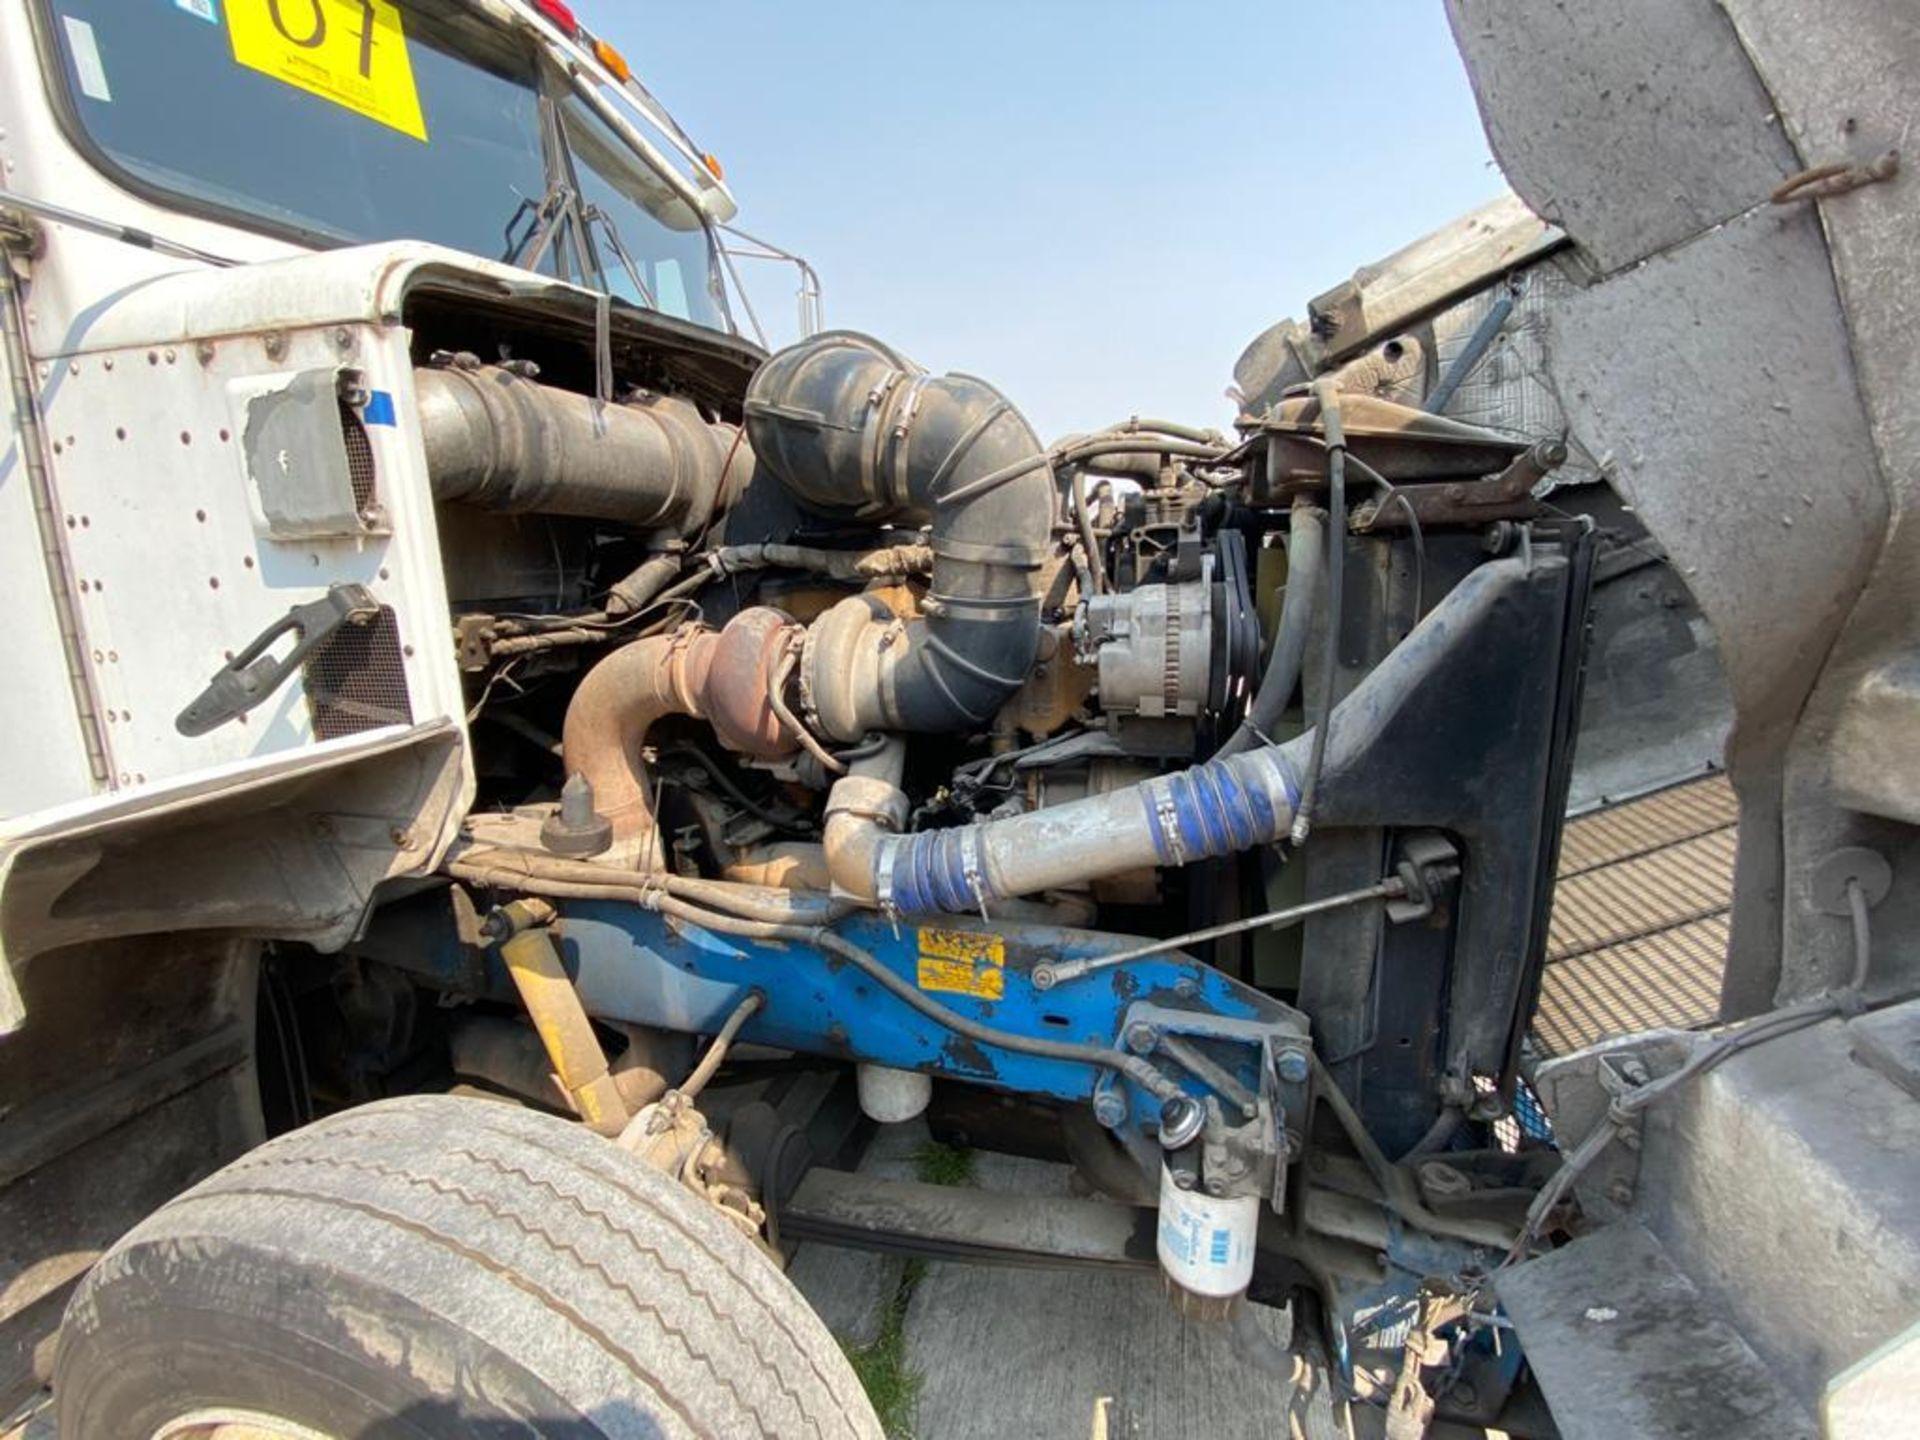 1999 Kenworth Sleeper truck tractor, standard transmission of 18 speeds - Image 61 of 72